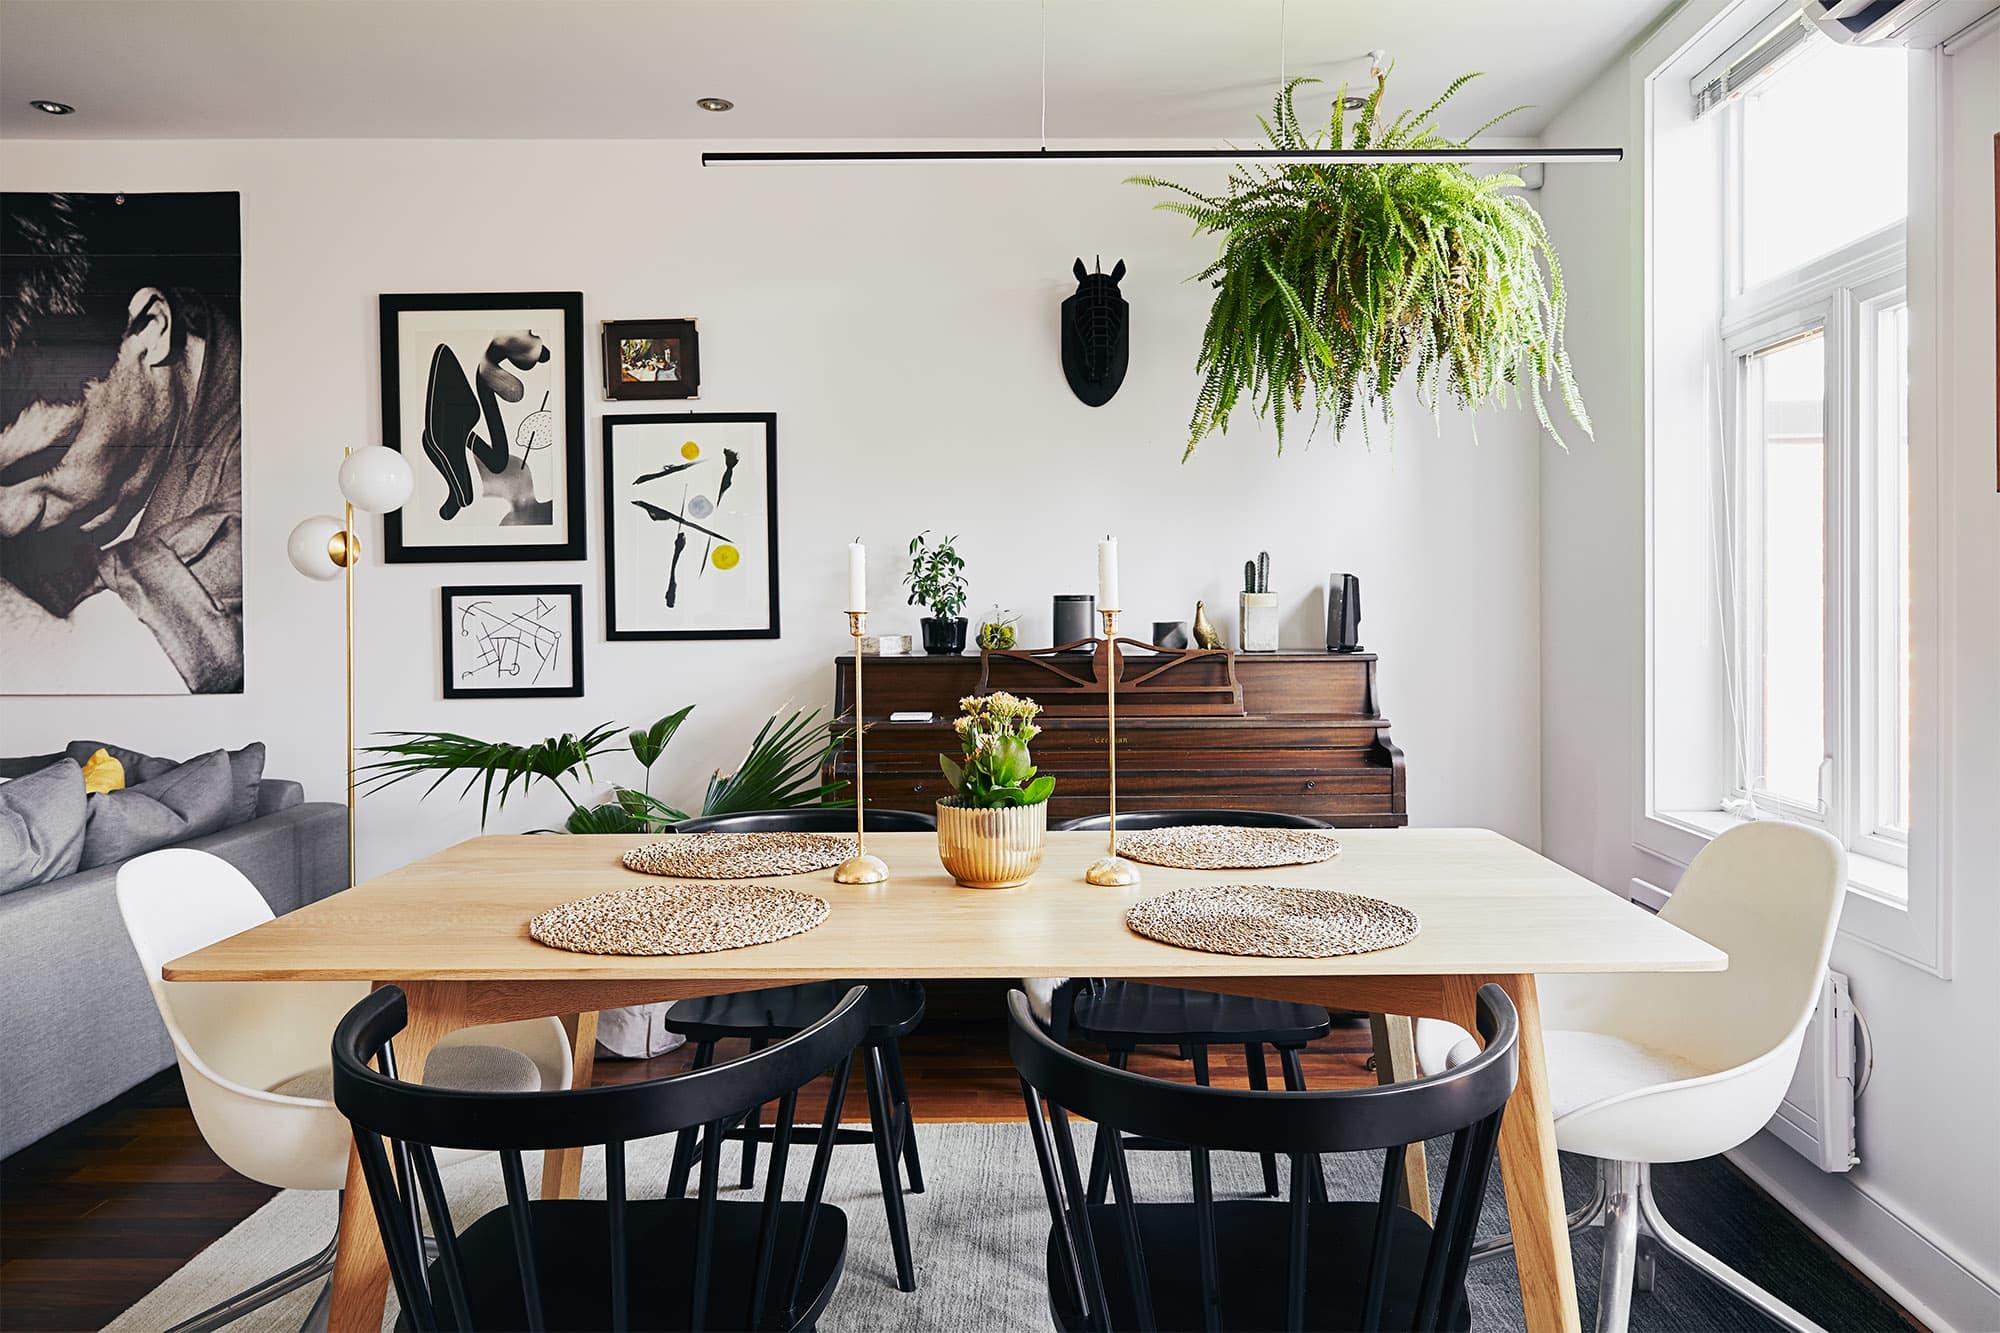 Minimal Modern Decor Ideas in a Montreal Apartment Tour | Apartment ...